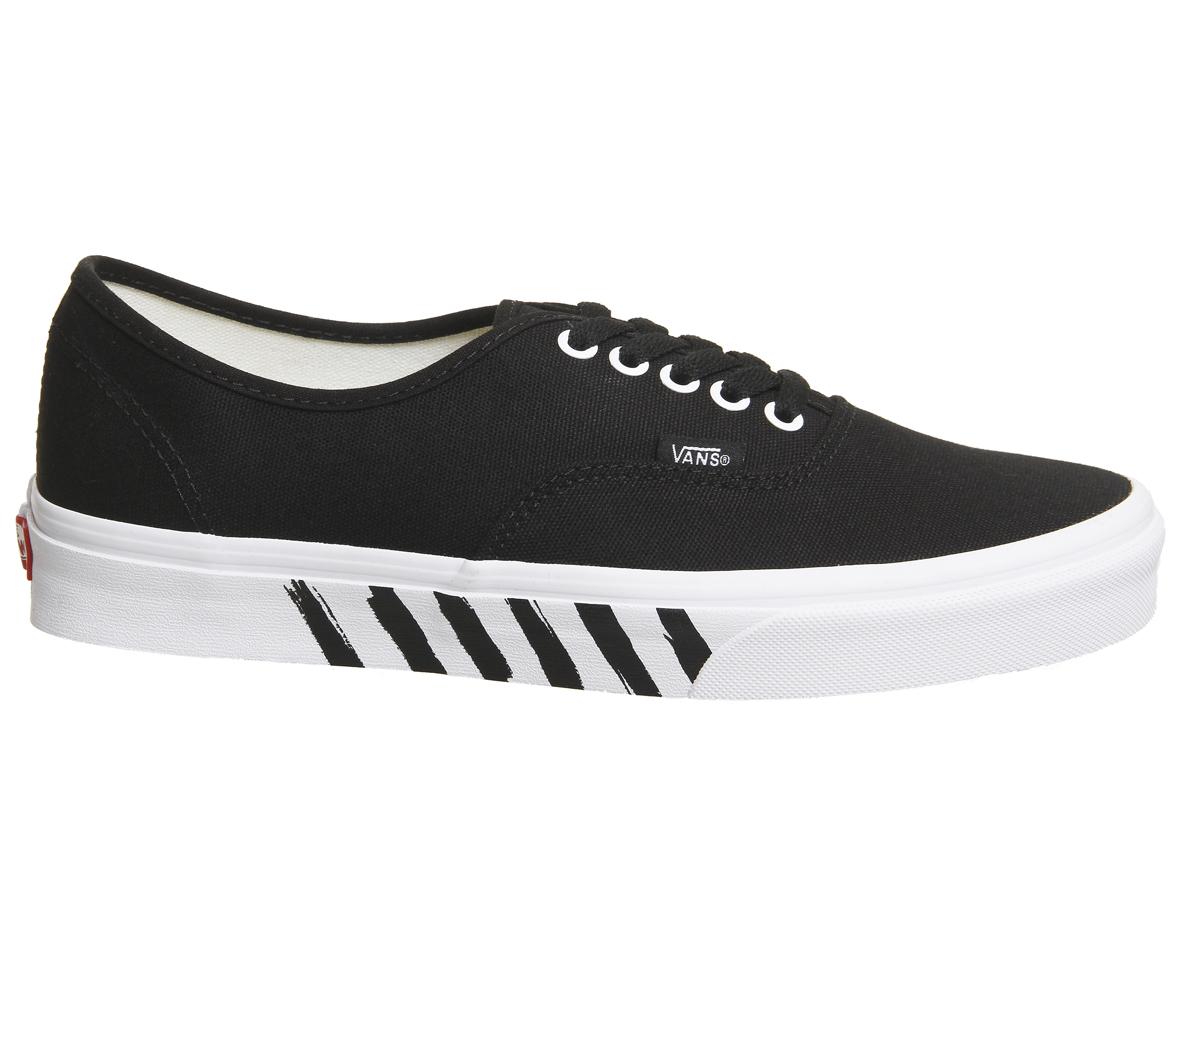 416574b393 Sentinel Mens Vans Authentic Trainers Black True White Stripe Trainers Shoes